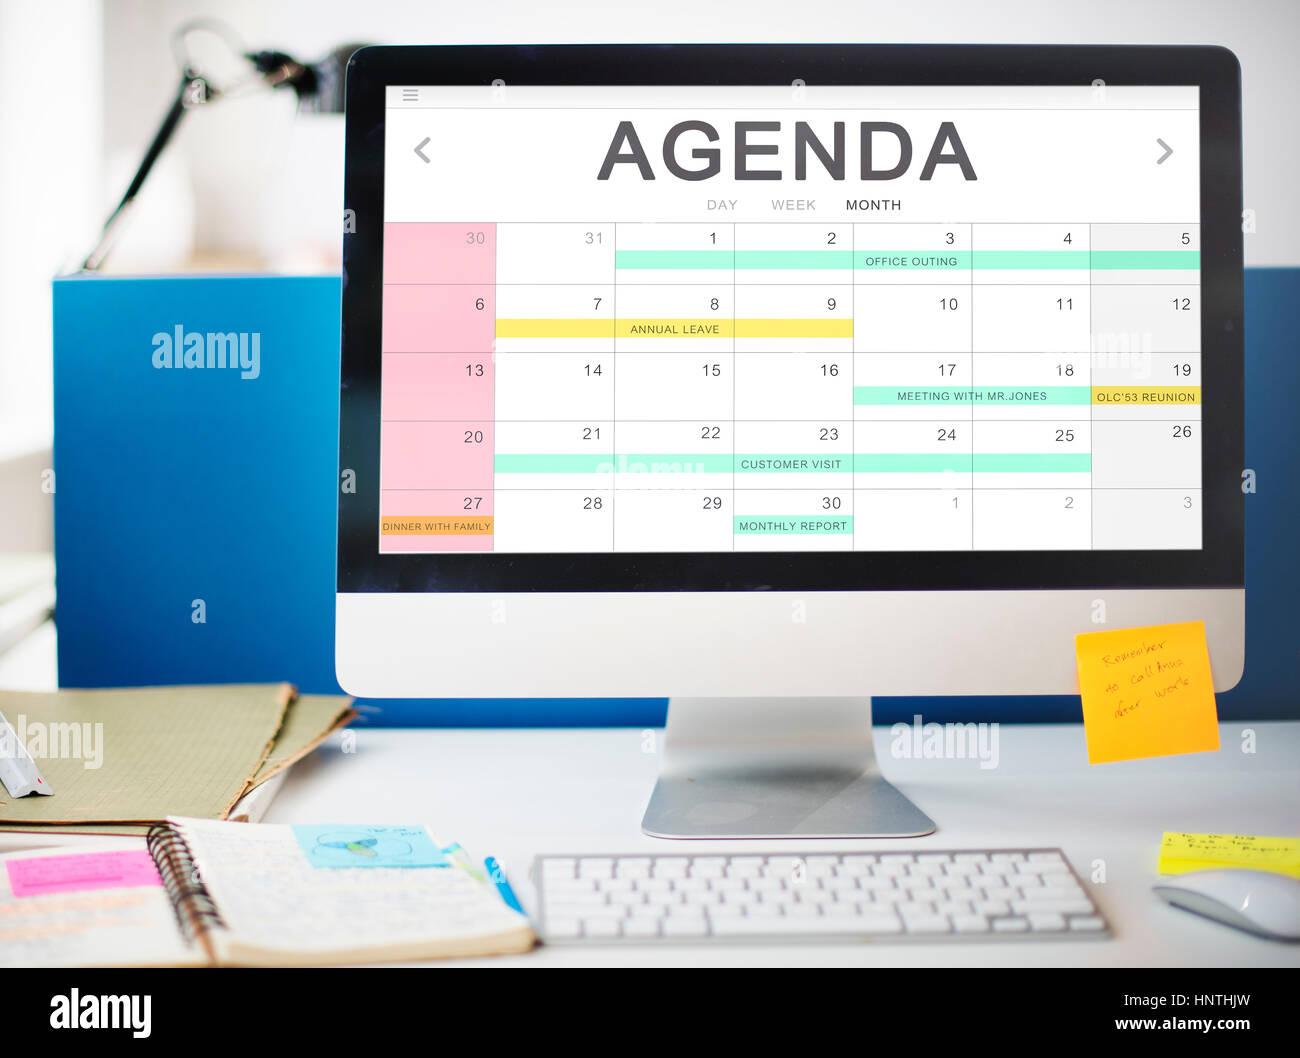 Calendar Agenda Event Meeting Reminder Schedule Graphic